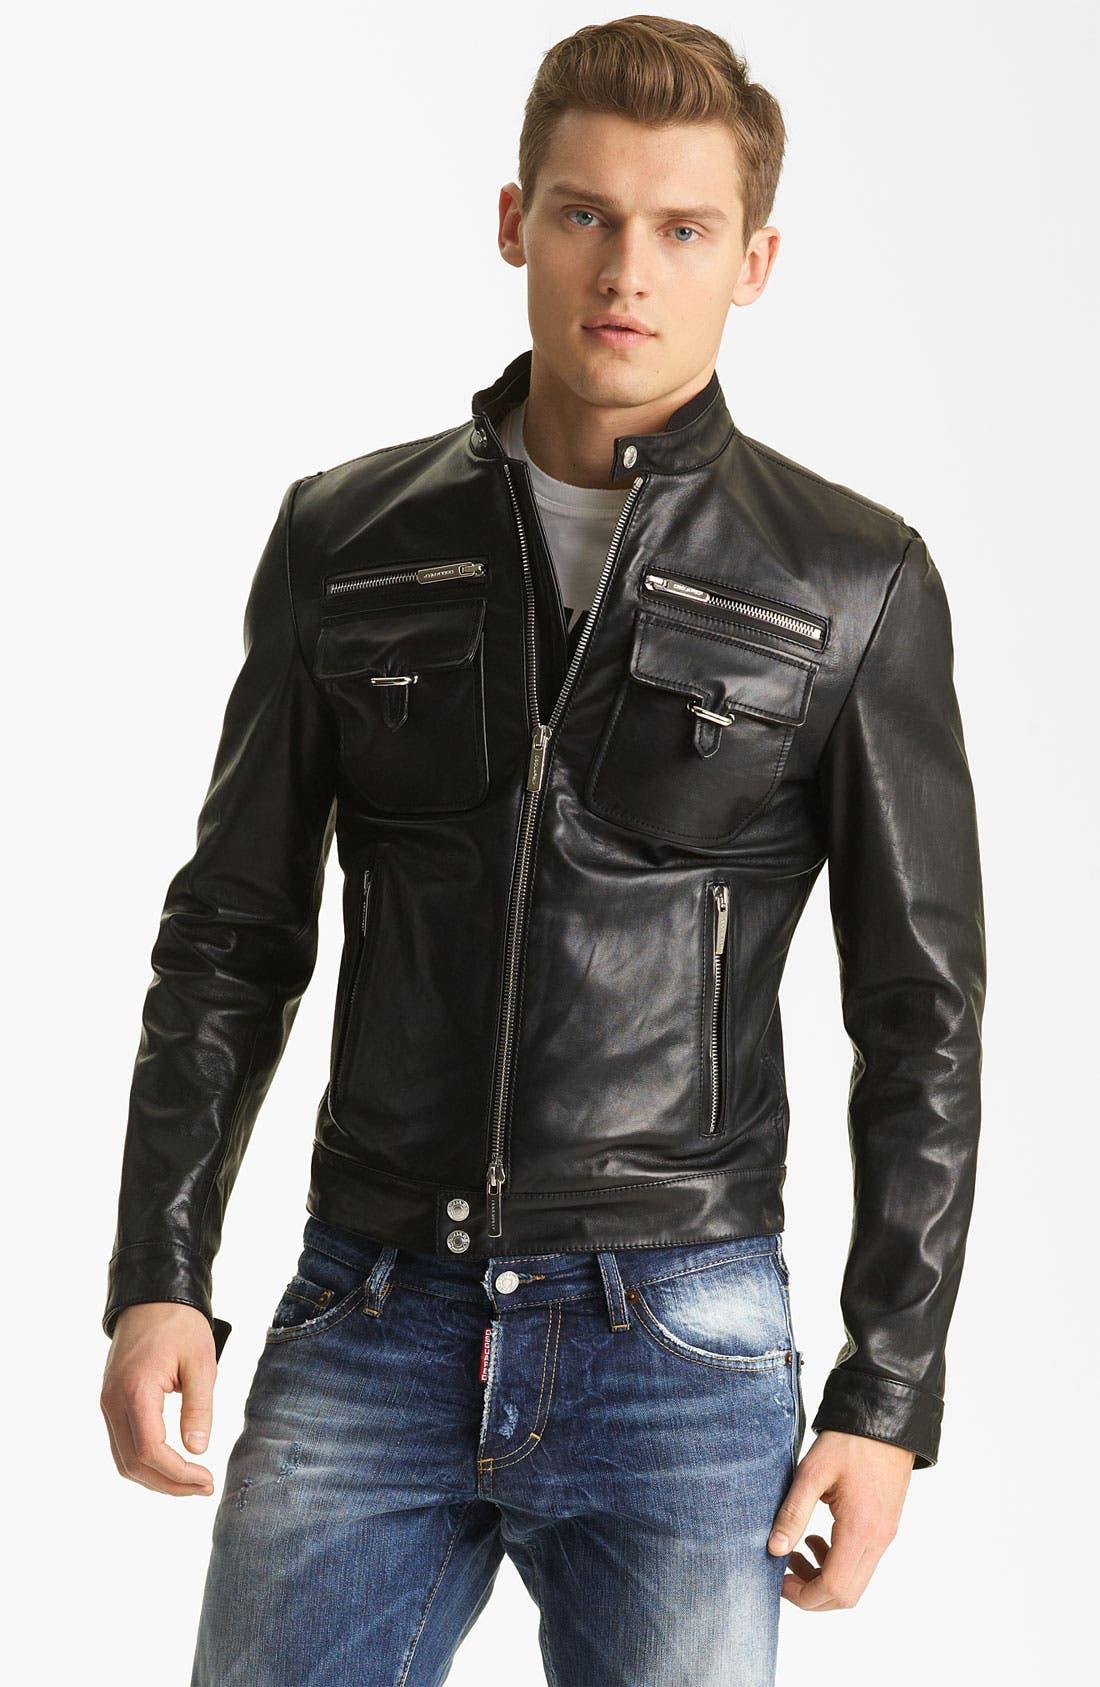 Alternate Image 1 Selected - Dsquared2 'Chic' Leather Moto Jacket